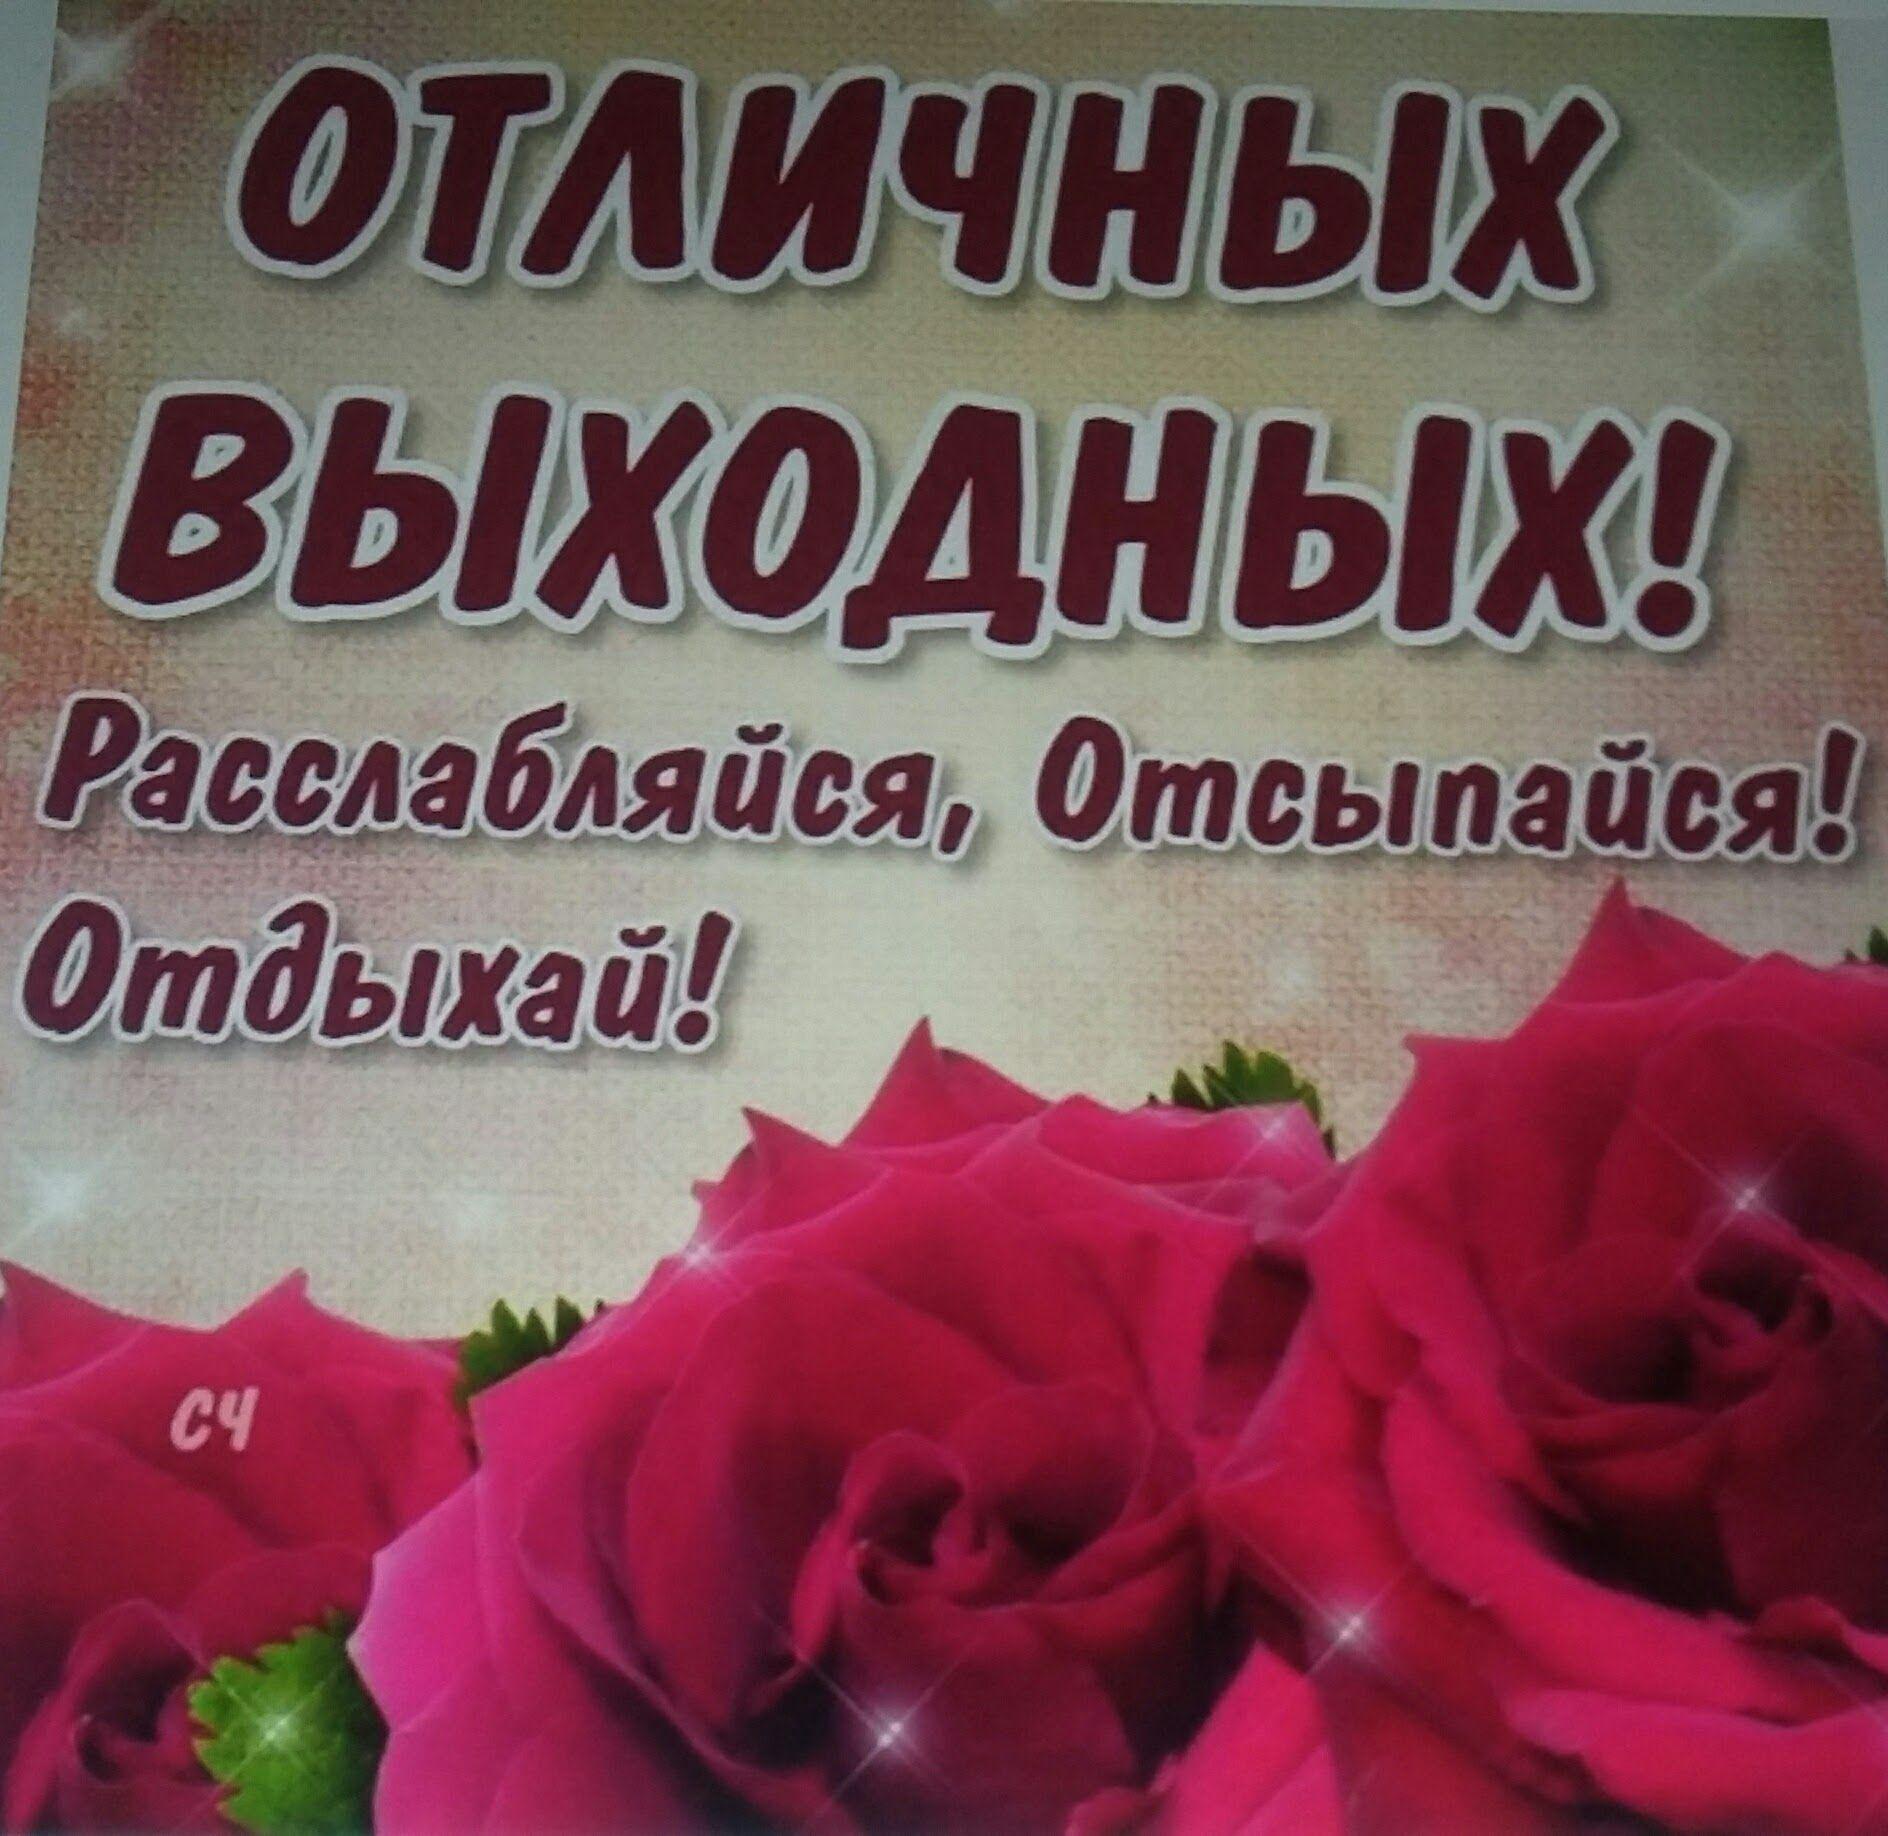 Pin by Svetlana Romanova on Открытки и поздравления